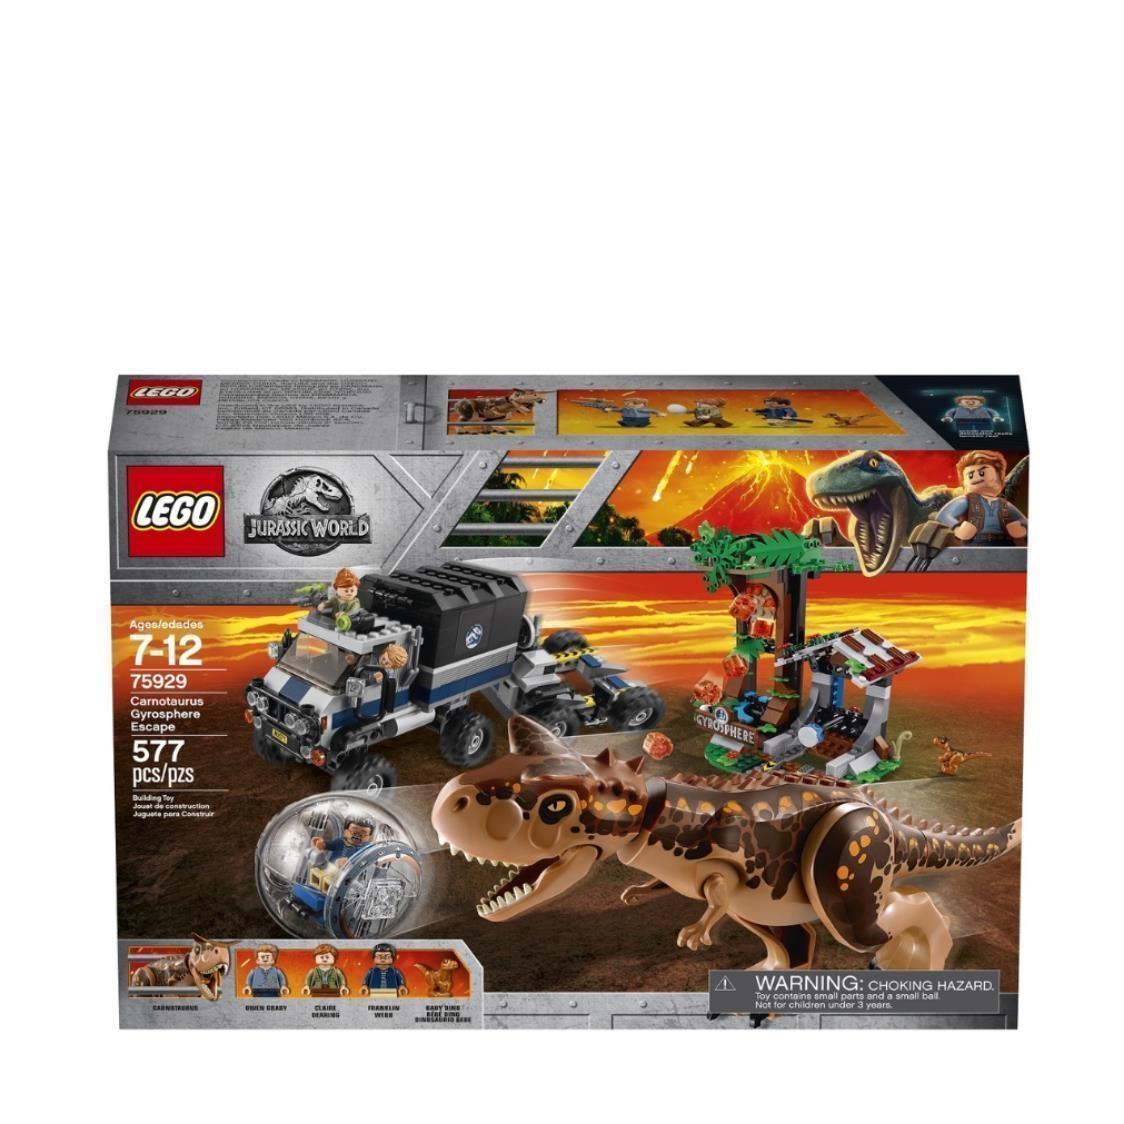 LEGO Jurassic World - Carnotaurus Gyrosphere Escape 75929 V29